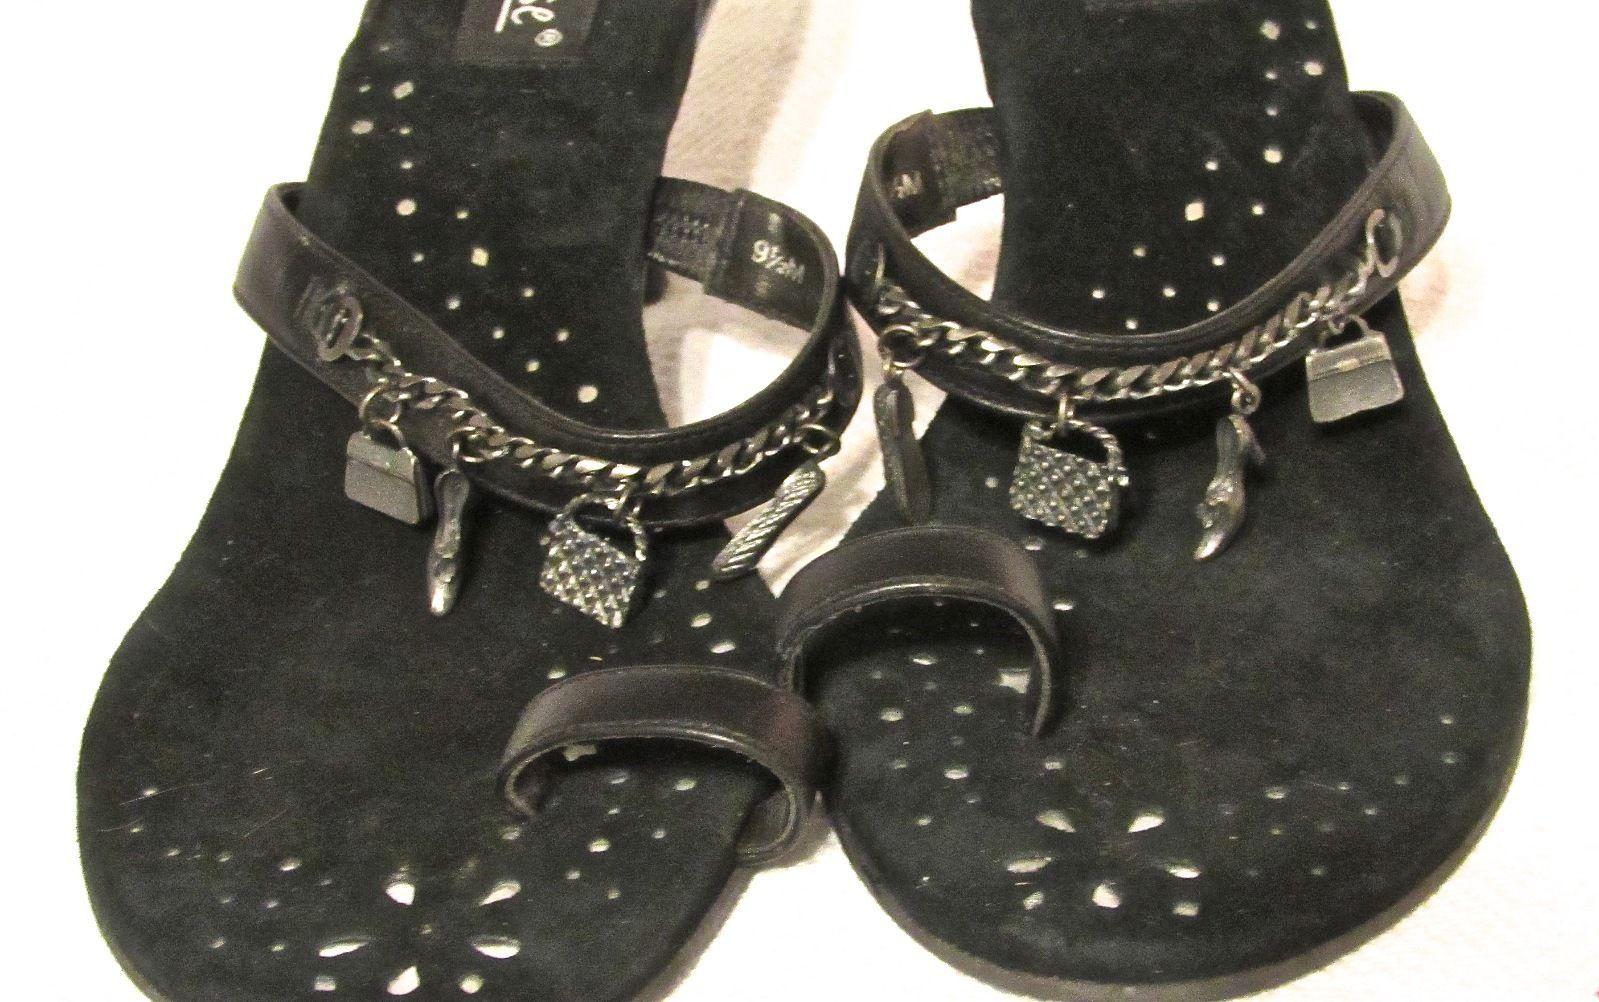 "Matisse Women's Black Leather Sandal/3"" Kitten Heel w/Embellishments S: 9.5 M"